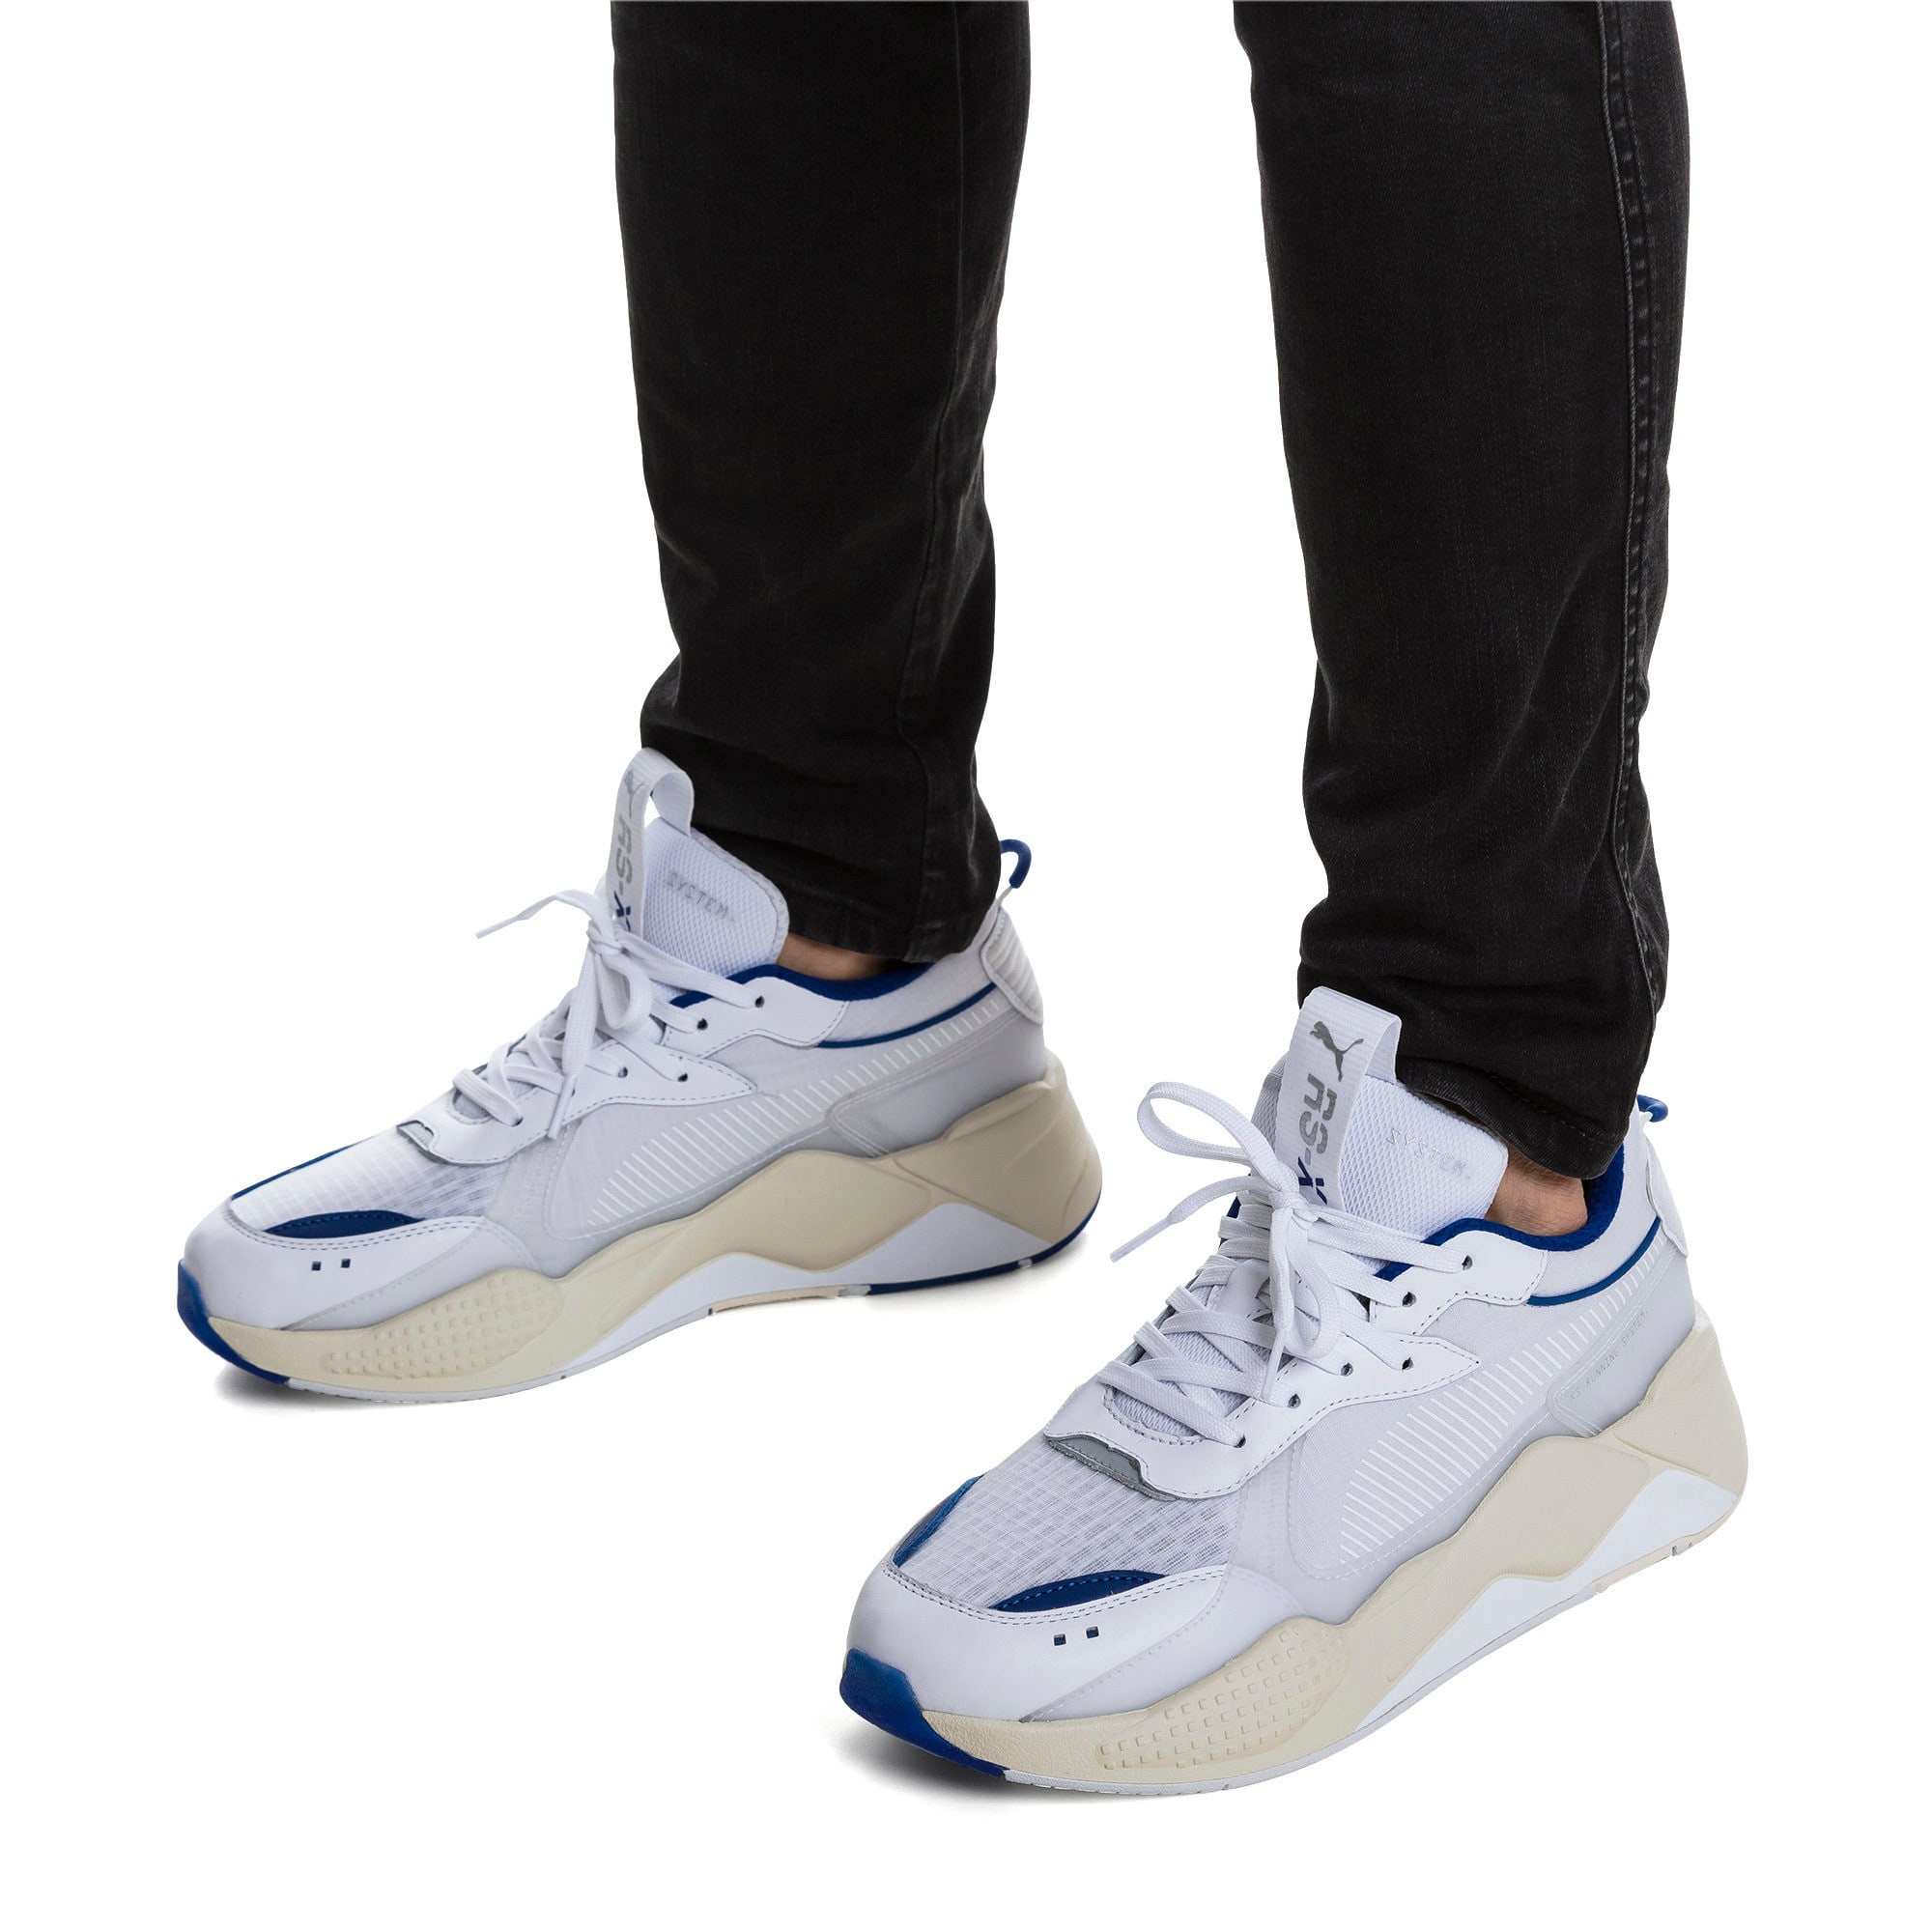 Thumbnail 2 of RS-X Tech Sneaker, Puma White-Whisper White, medium